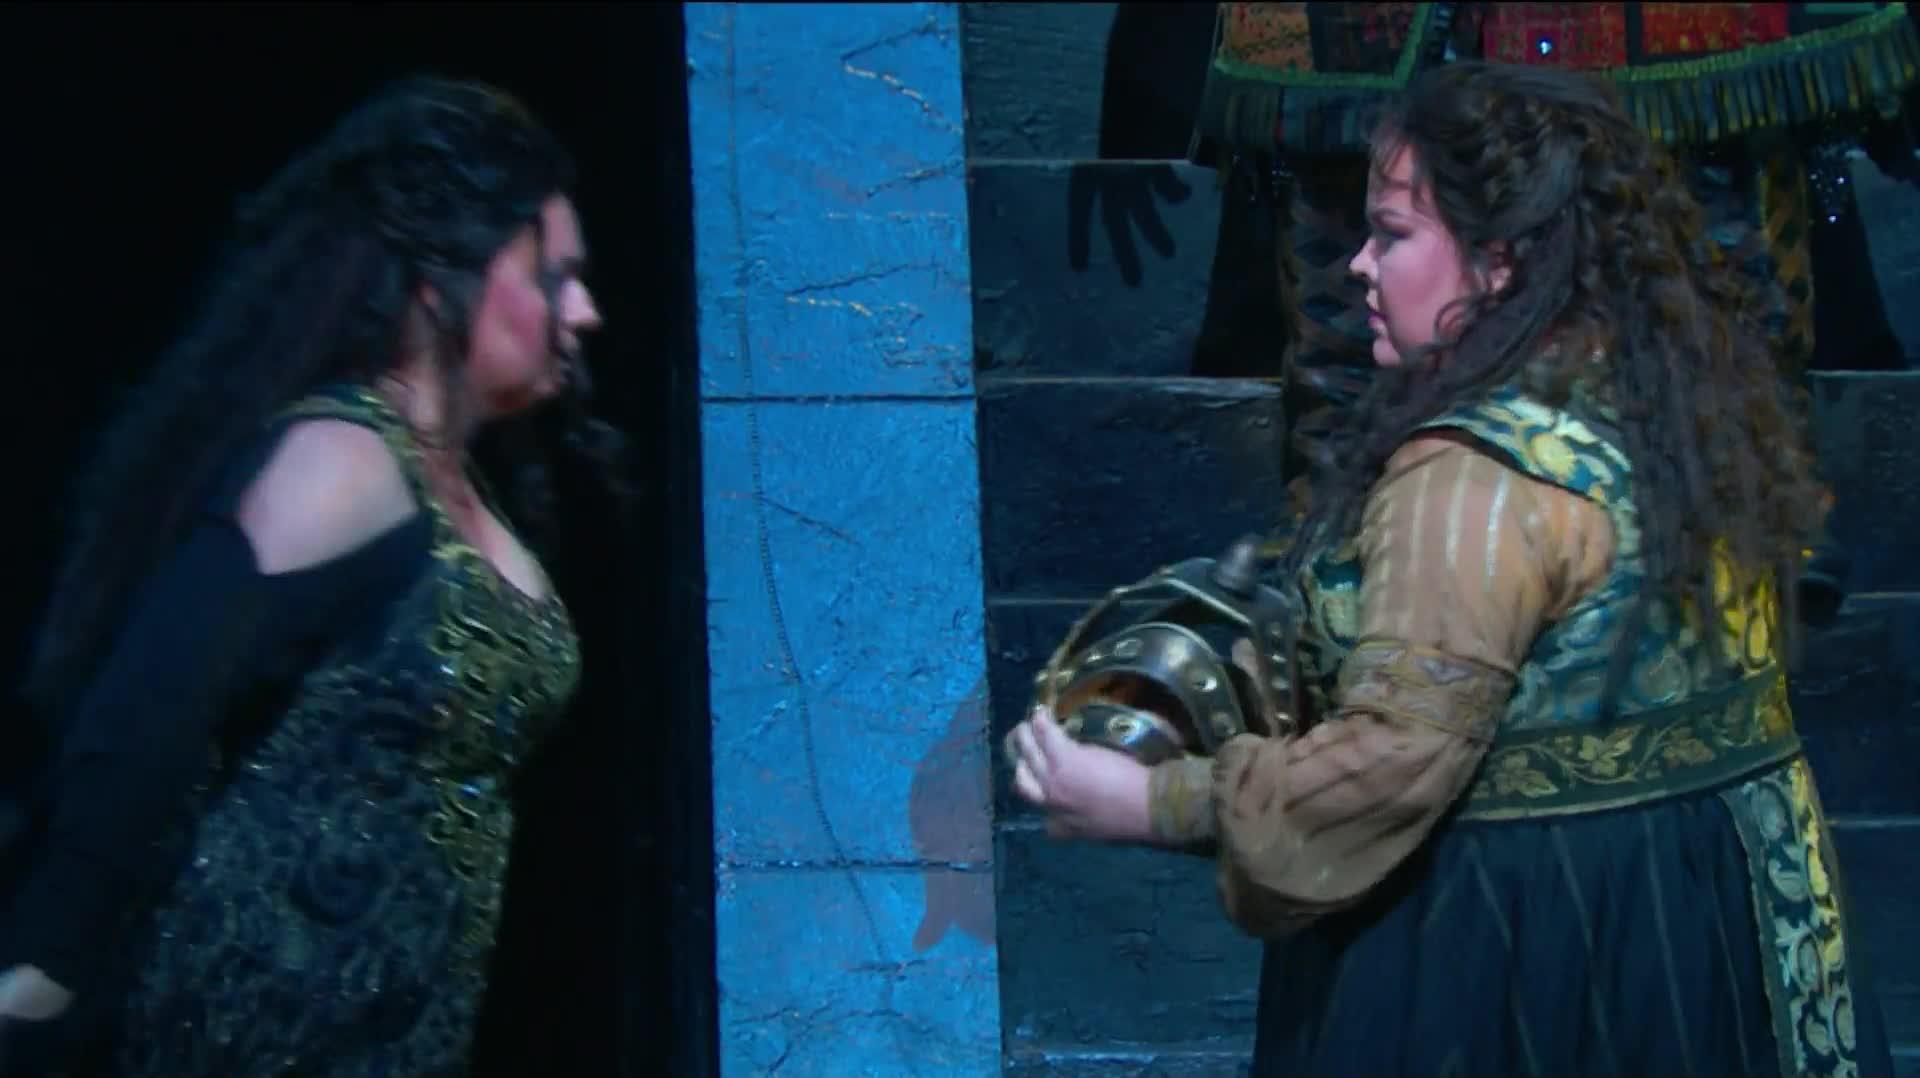 Opera - Nabucco - Giuseppe Verdi (2017) 1080p Napisy PL [MAXPAYNER] 720p